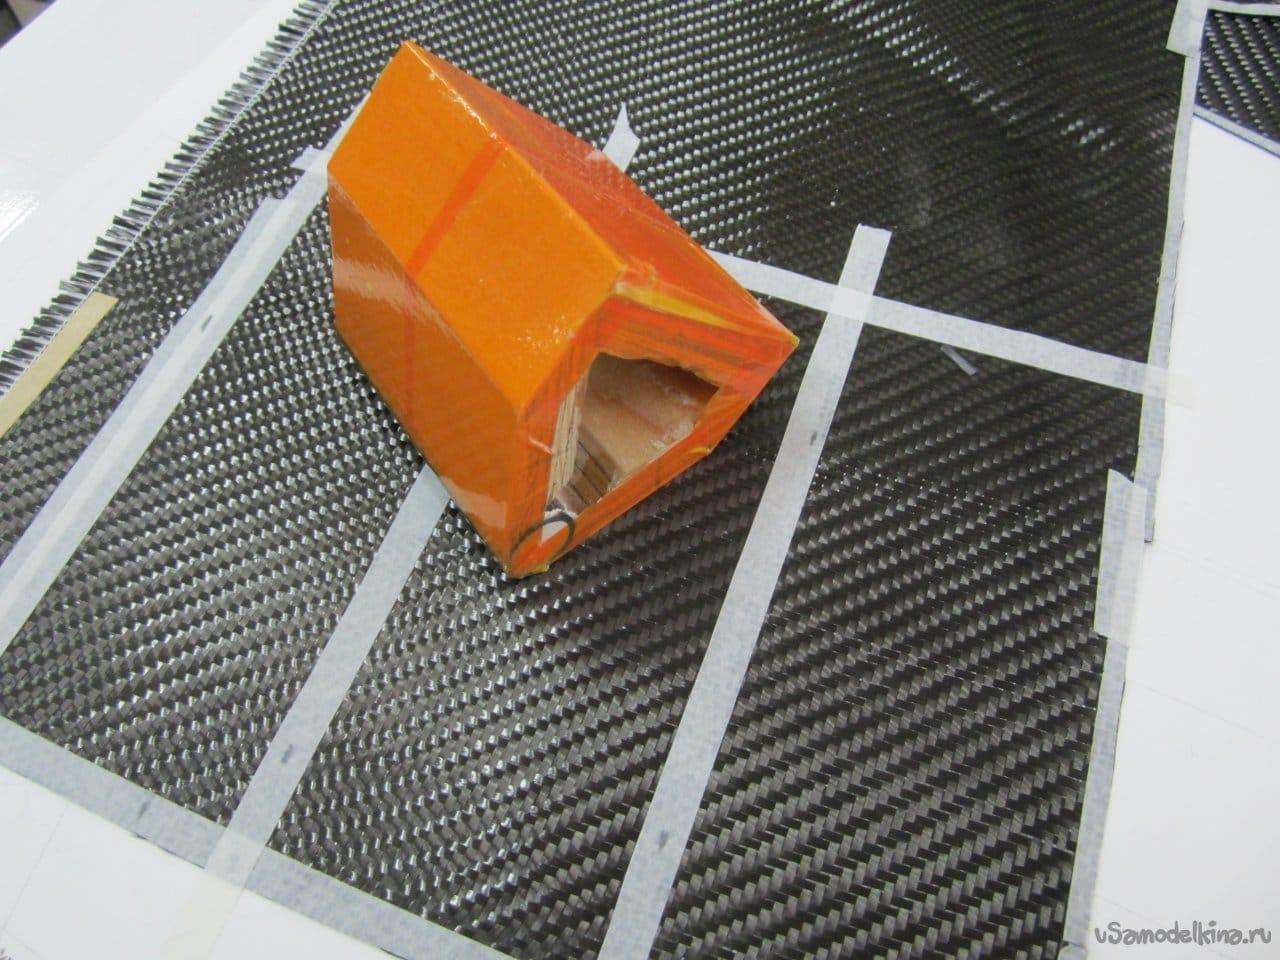 Закладка карбонового фюзеляжа планера класса F5J